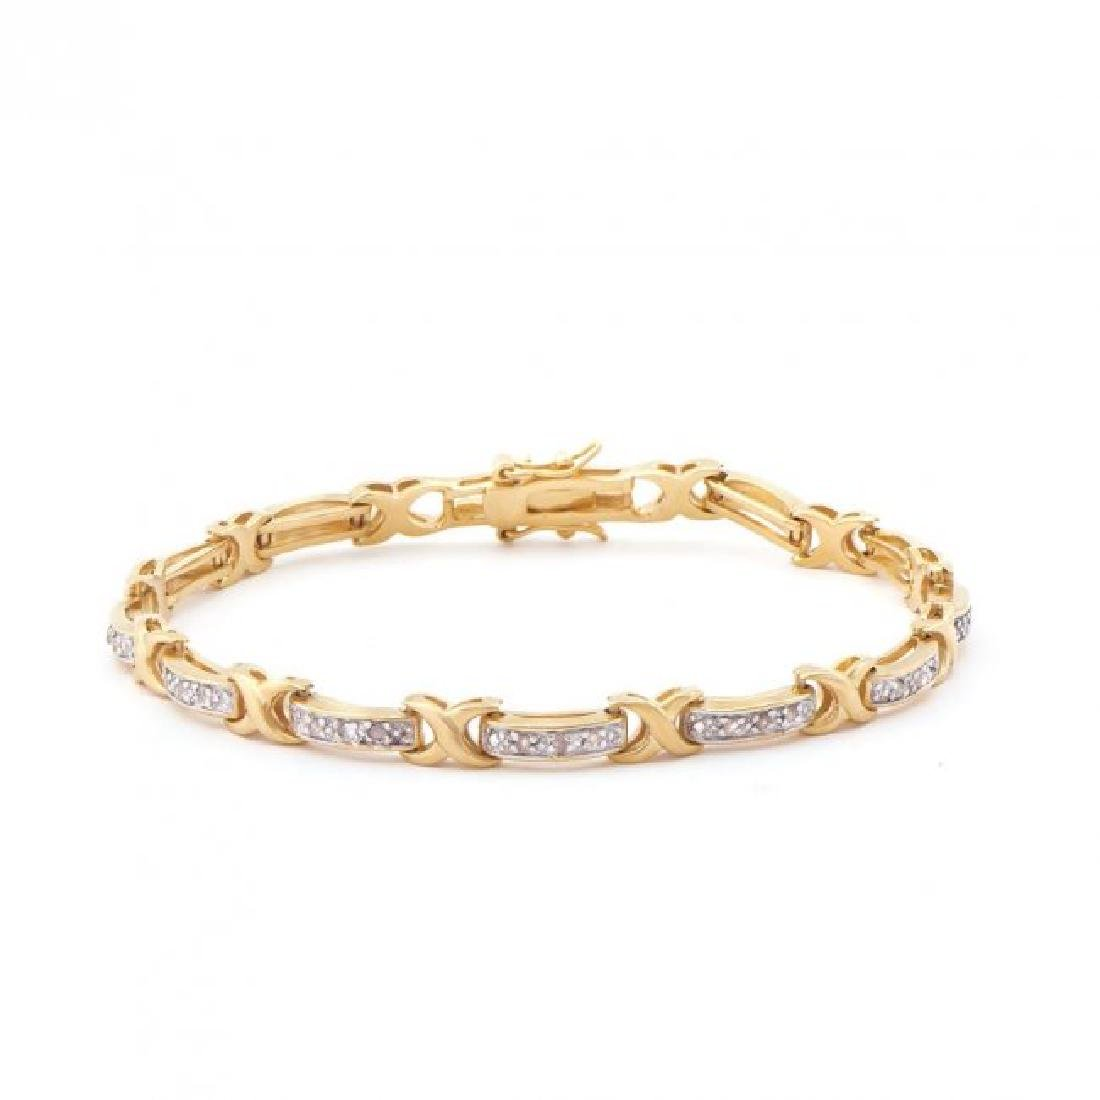 0.81 CT Diamond Designer Bracelet List Price $1,165!